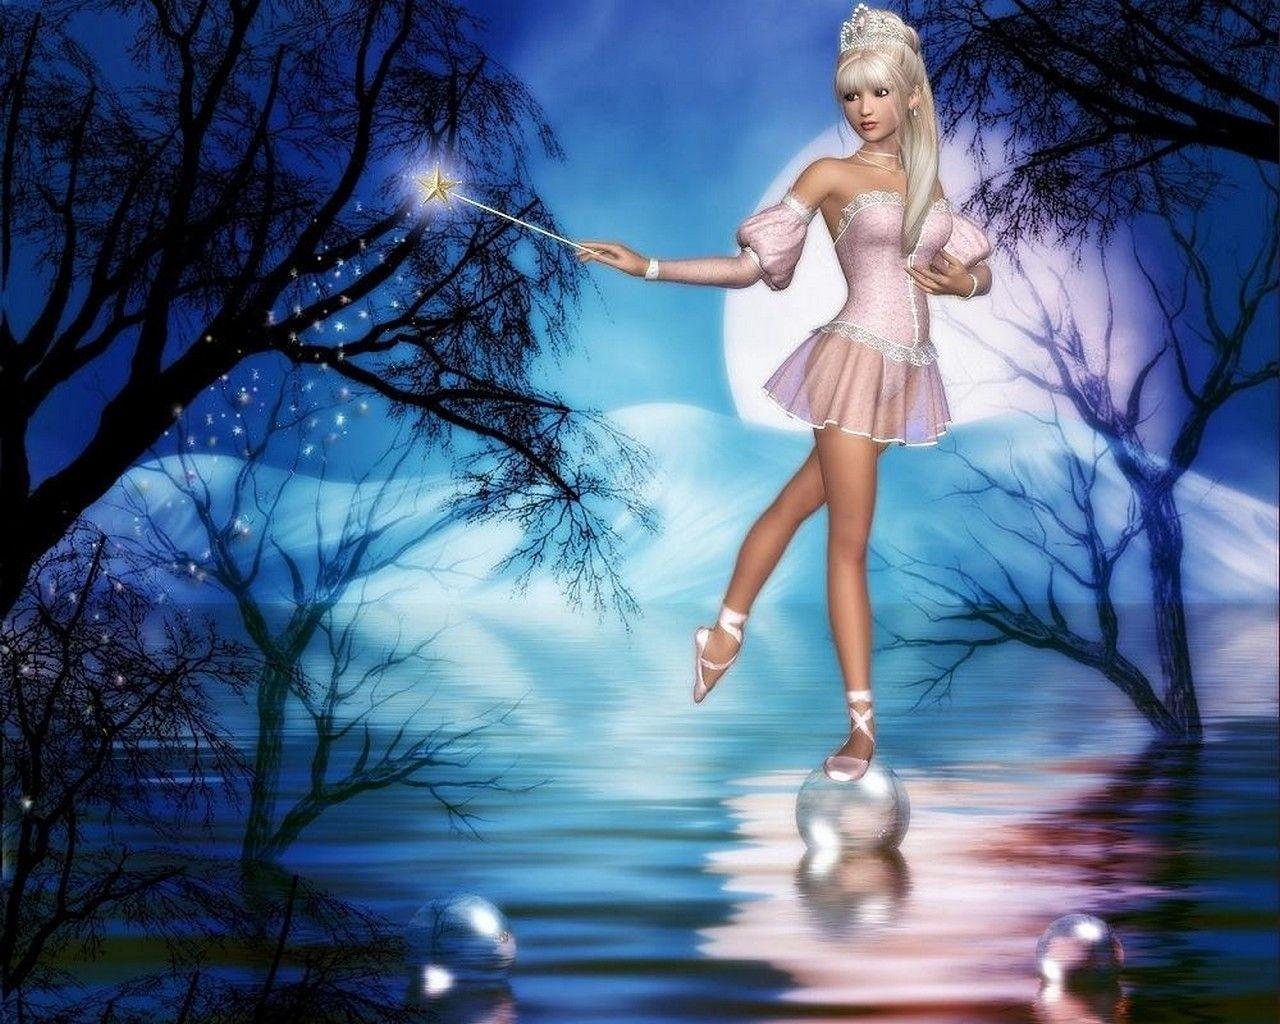 Fantasy Fairy Desktop Wallpaper Fairy Wallpaper Desktop Wallpaper Description Princess Fairy Wallpaper Fairy Wallpaper Fairy Background Beautiful Fairies